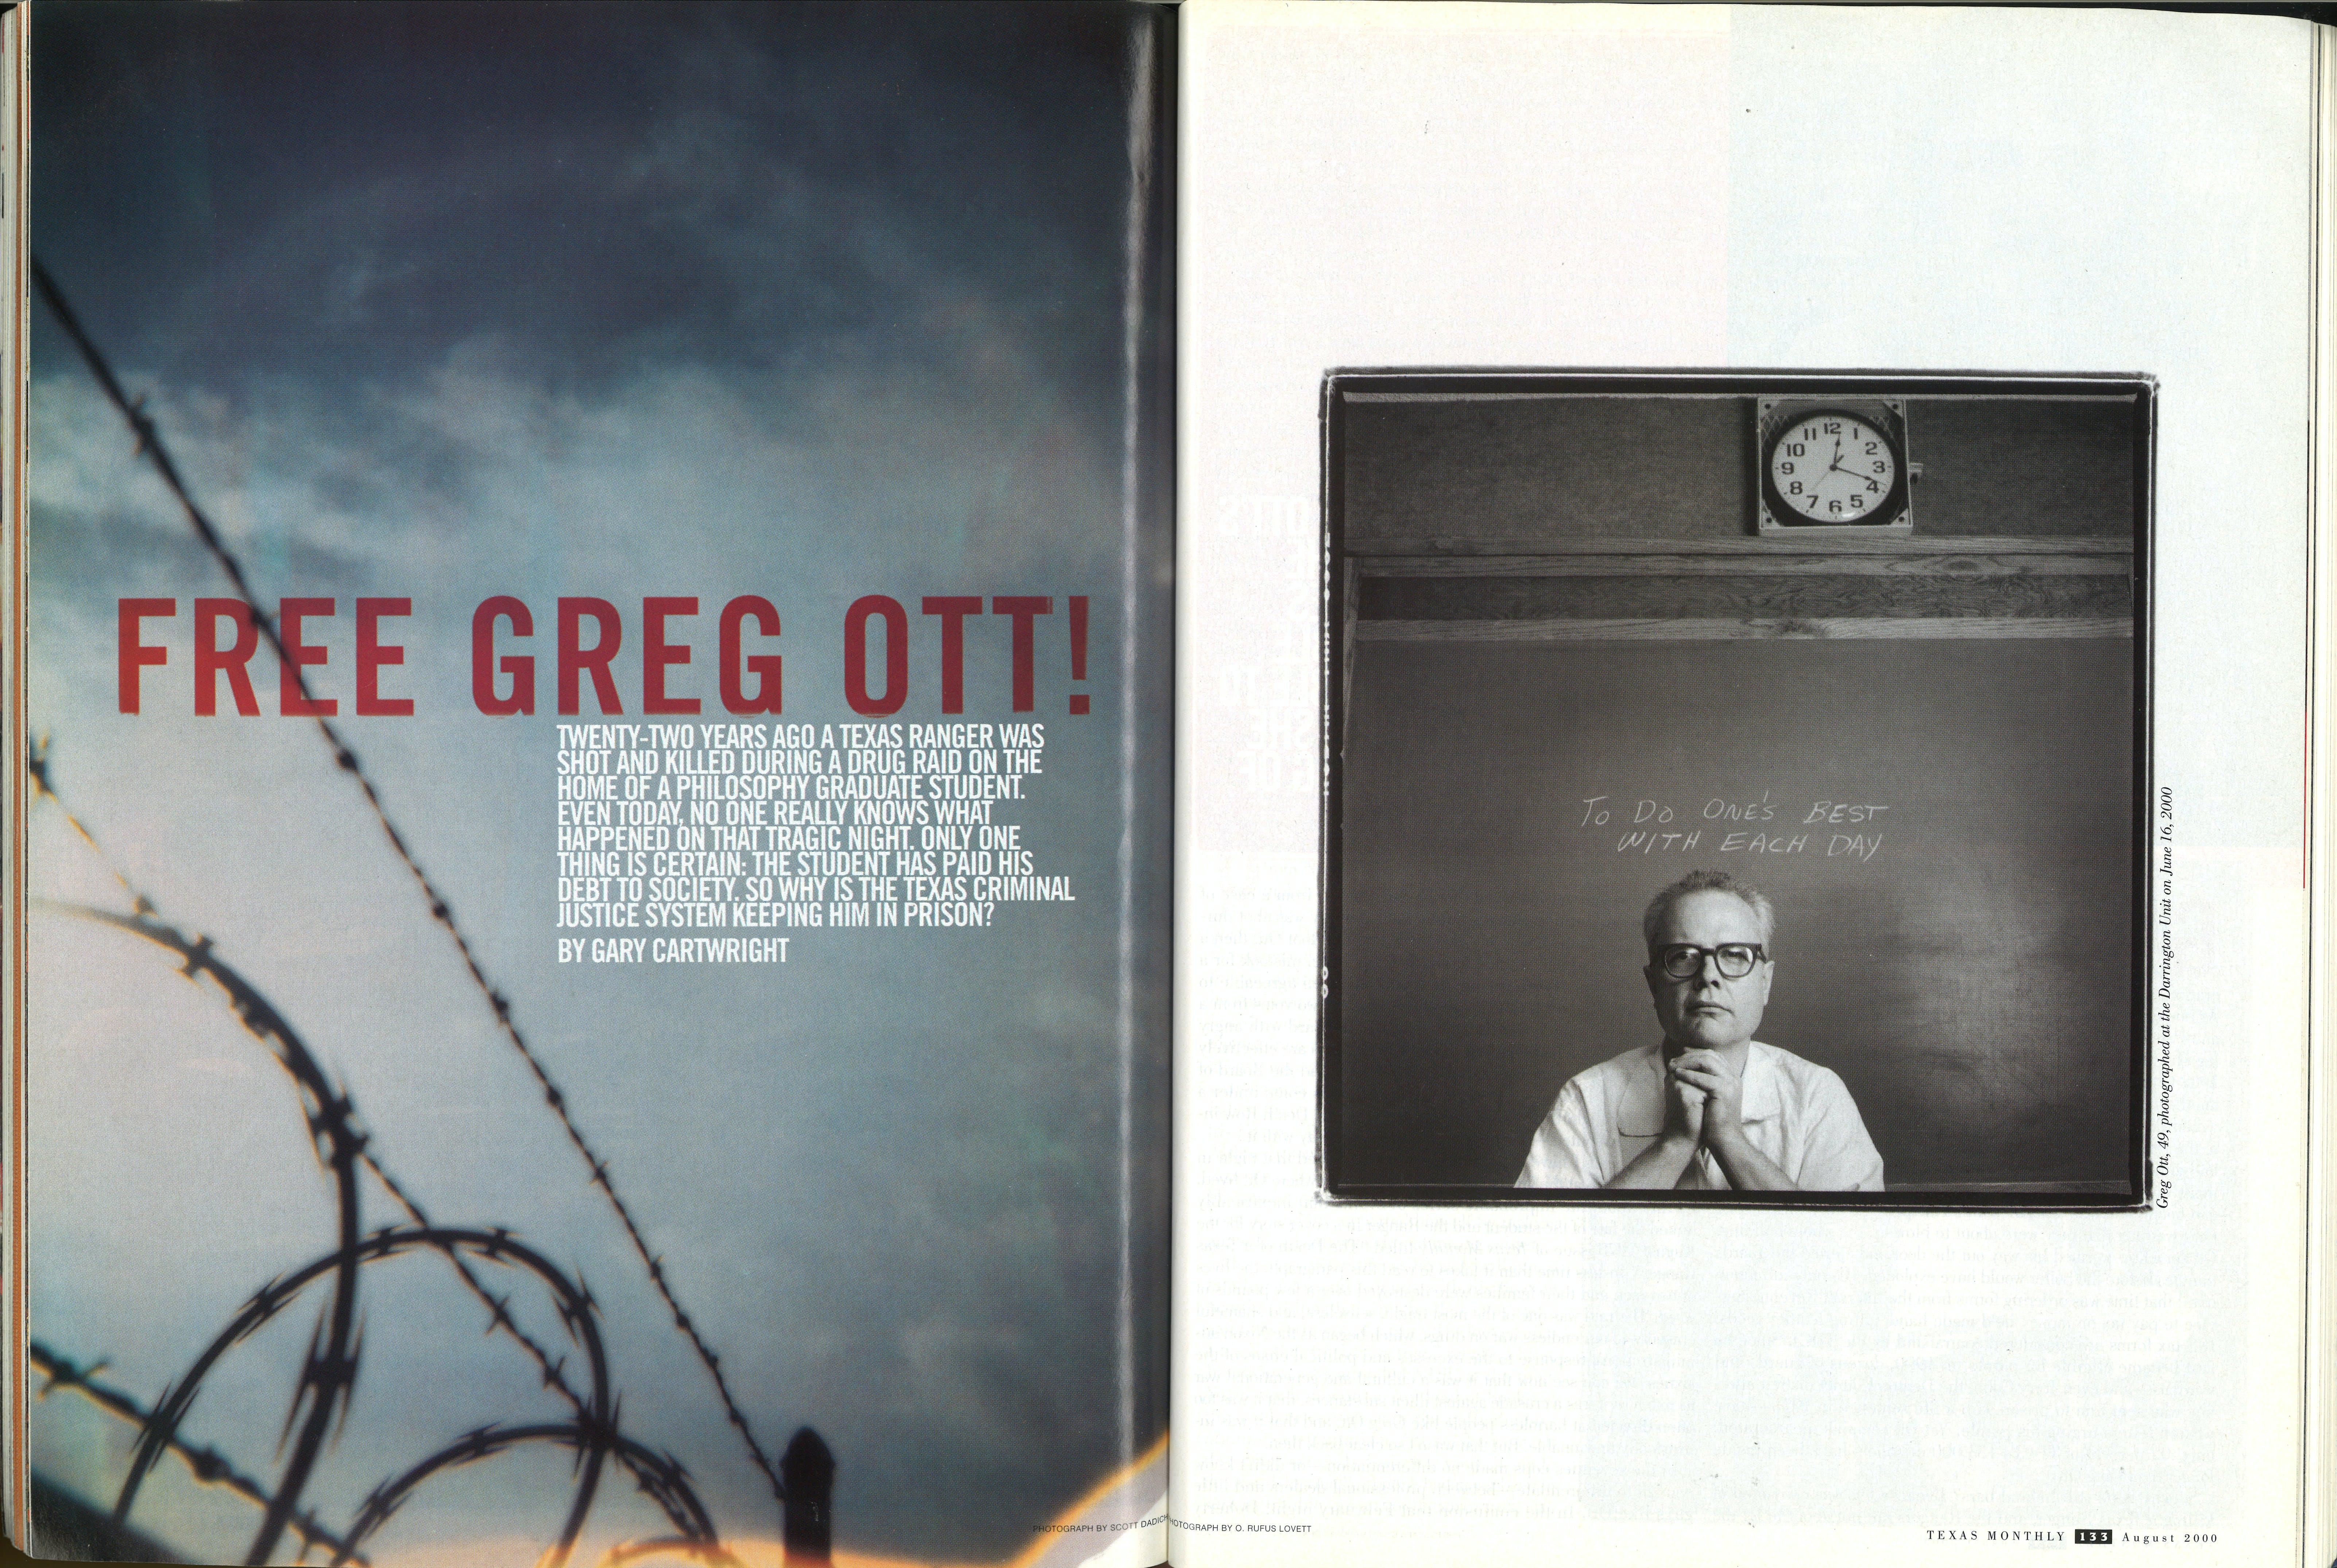 Free Greg Ott! – Texas Monthly